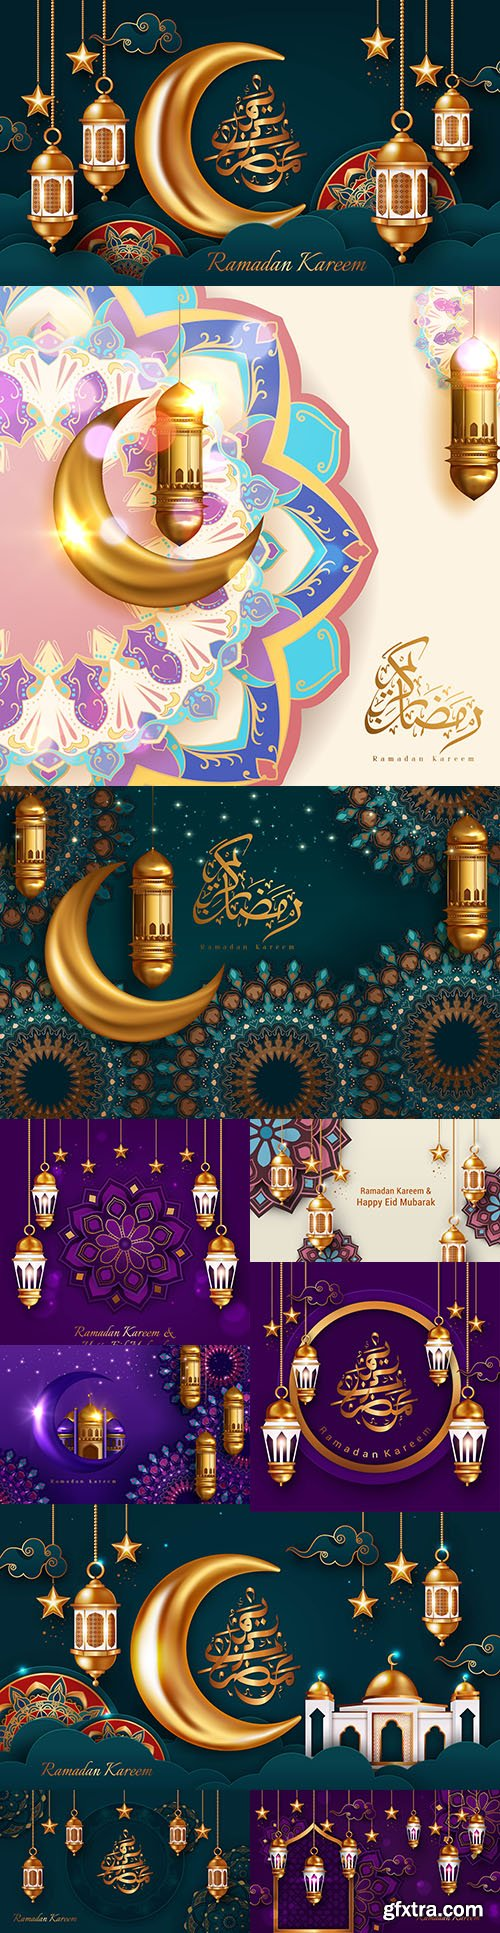 Ramadan Kareem backgrounds with golden lantern and crescent